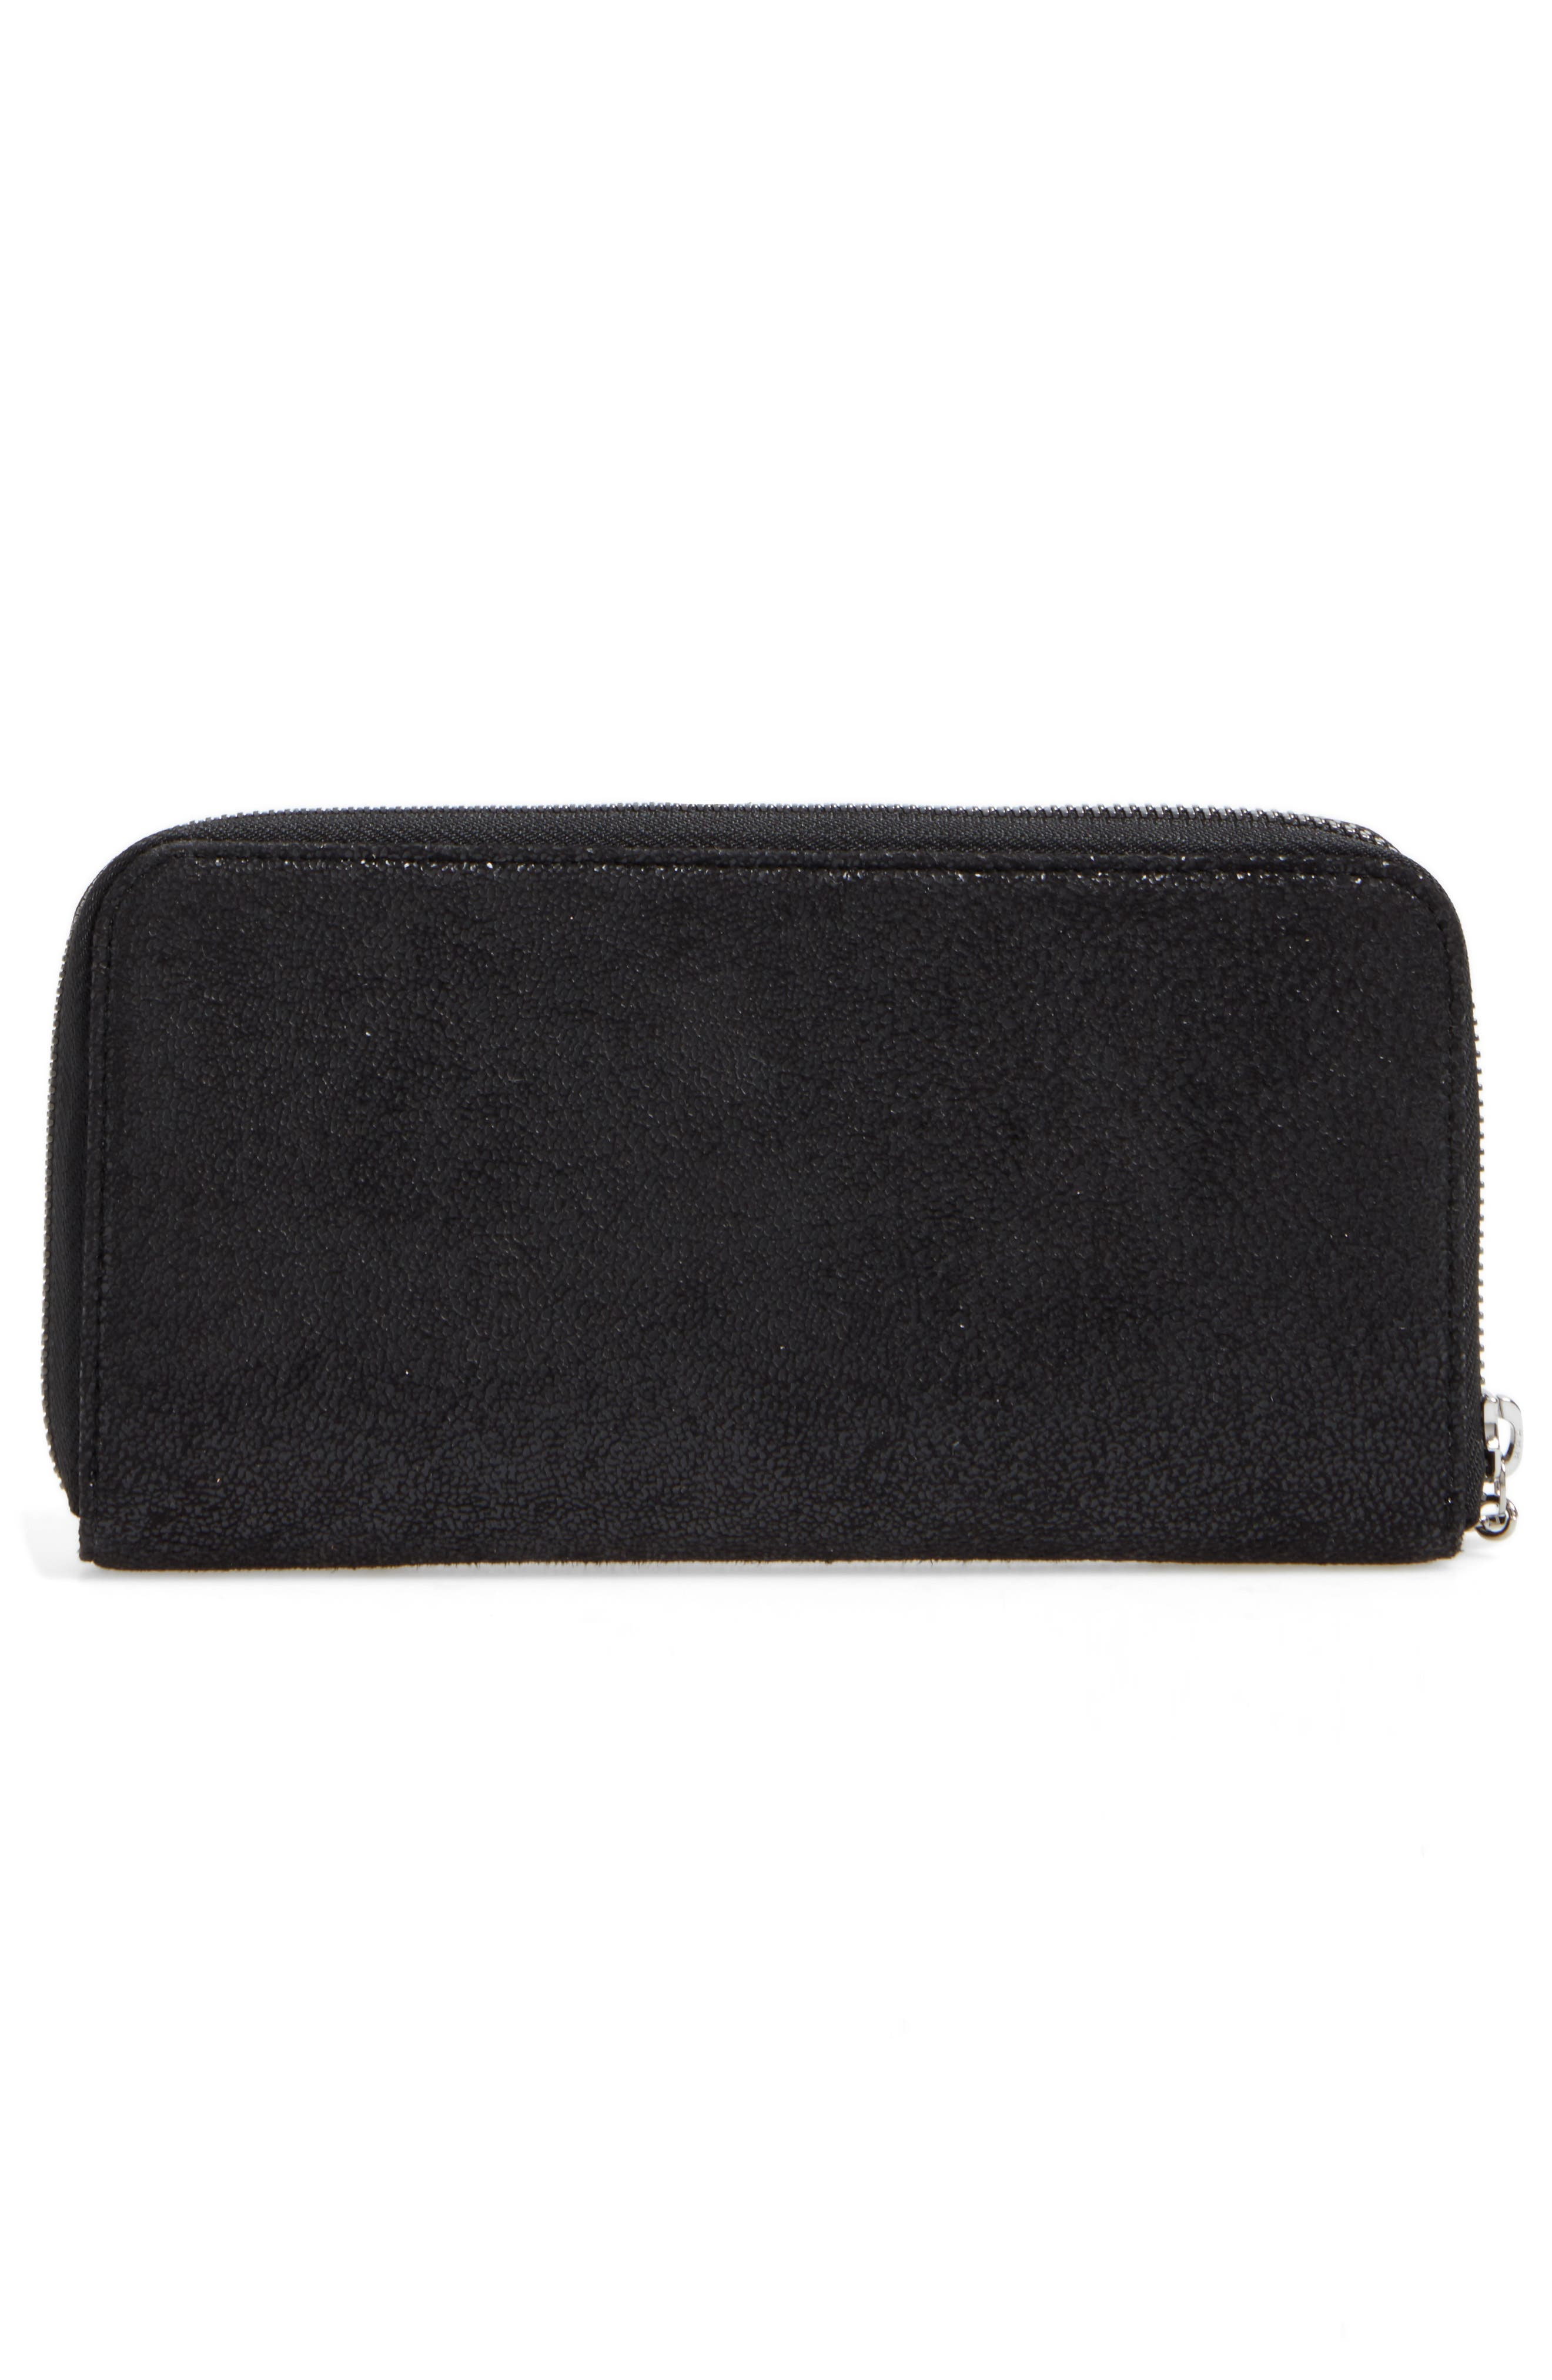 Falabella Faux Leather Wallet,                             Alternate thumbnail 4, color,                             001